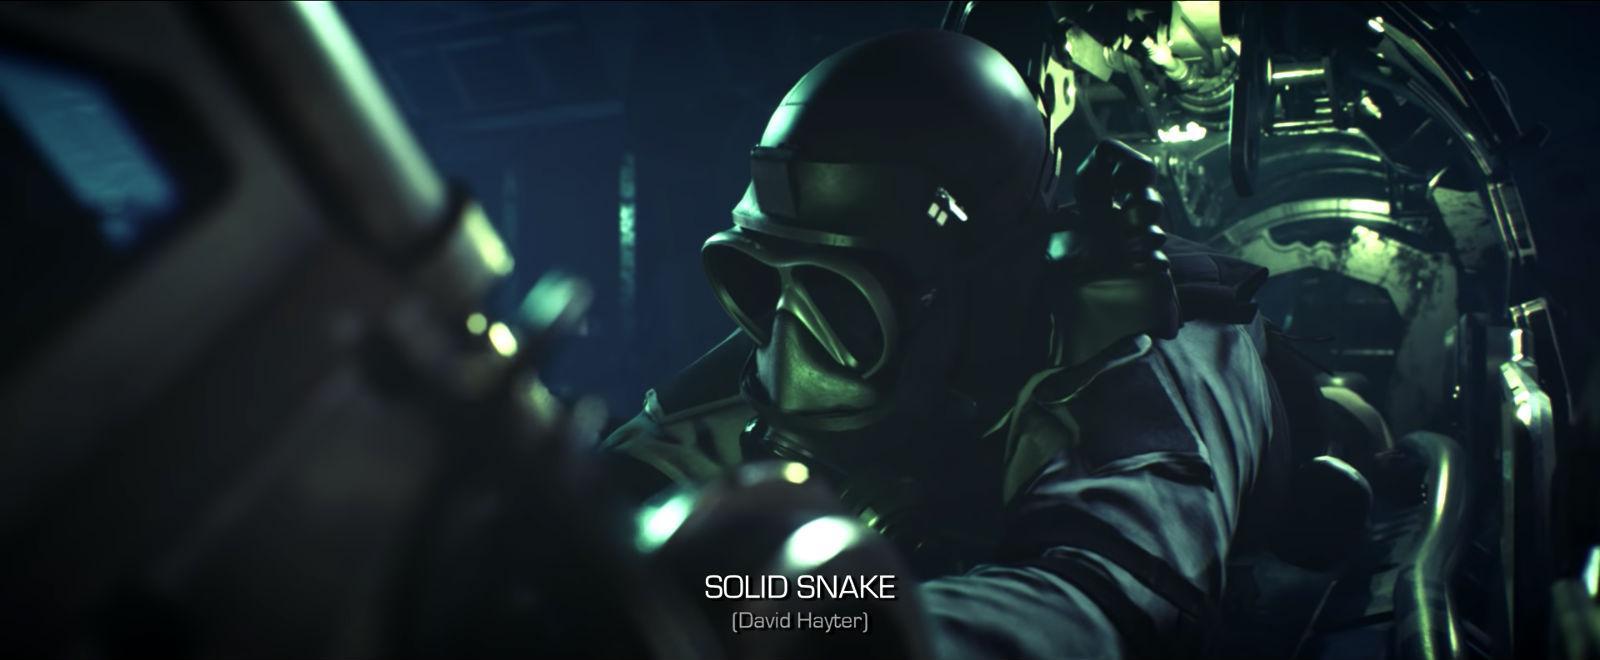 Metal Gear Solid intro remake